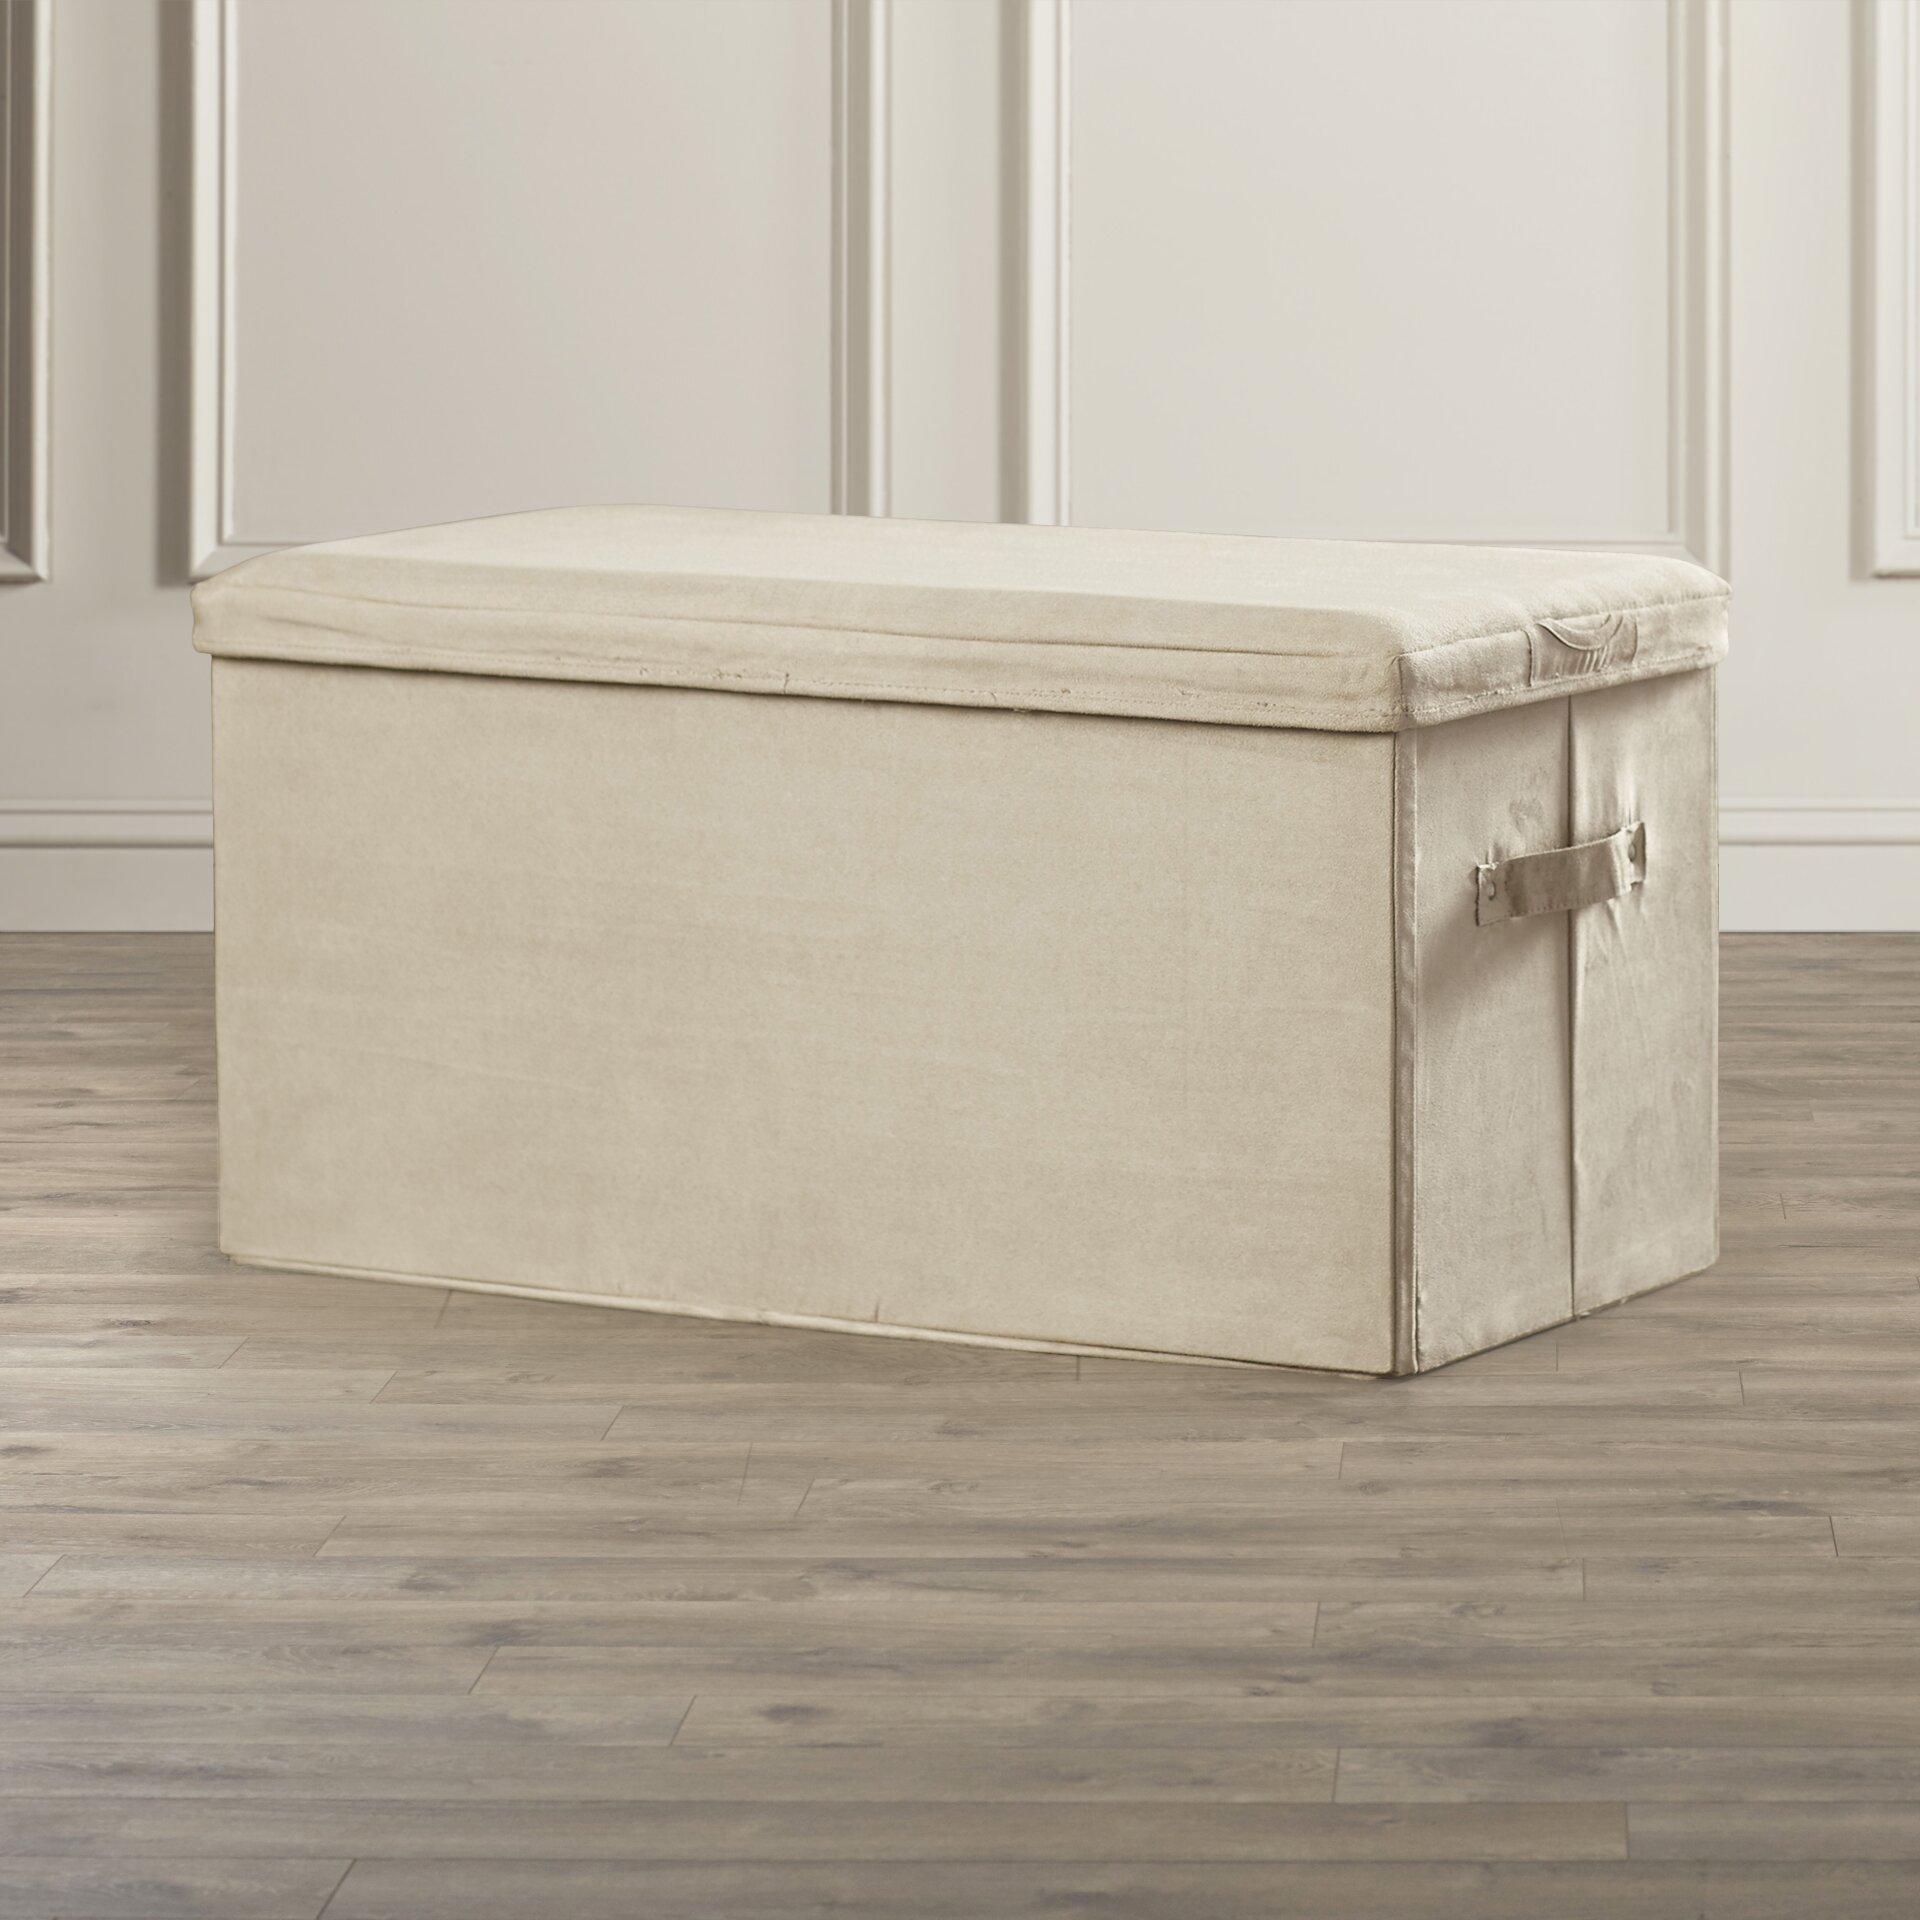 symple stuff wood storage bedroom bench reviews wayfair. Black Bedroom Furniture Sets. Home Design Ideas